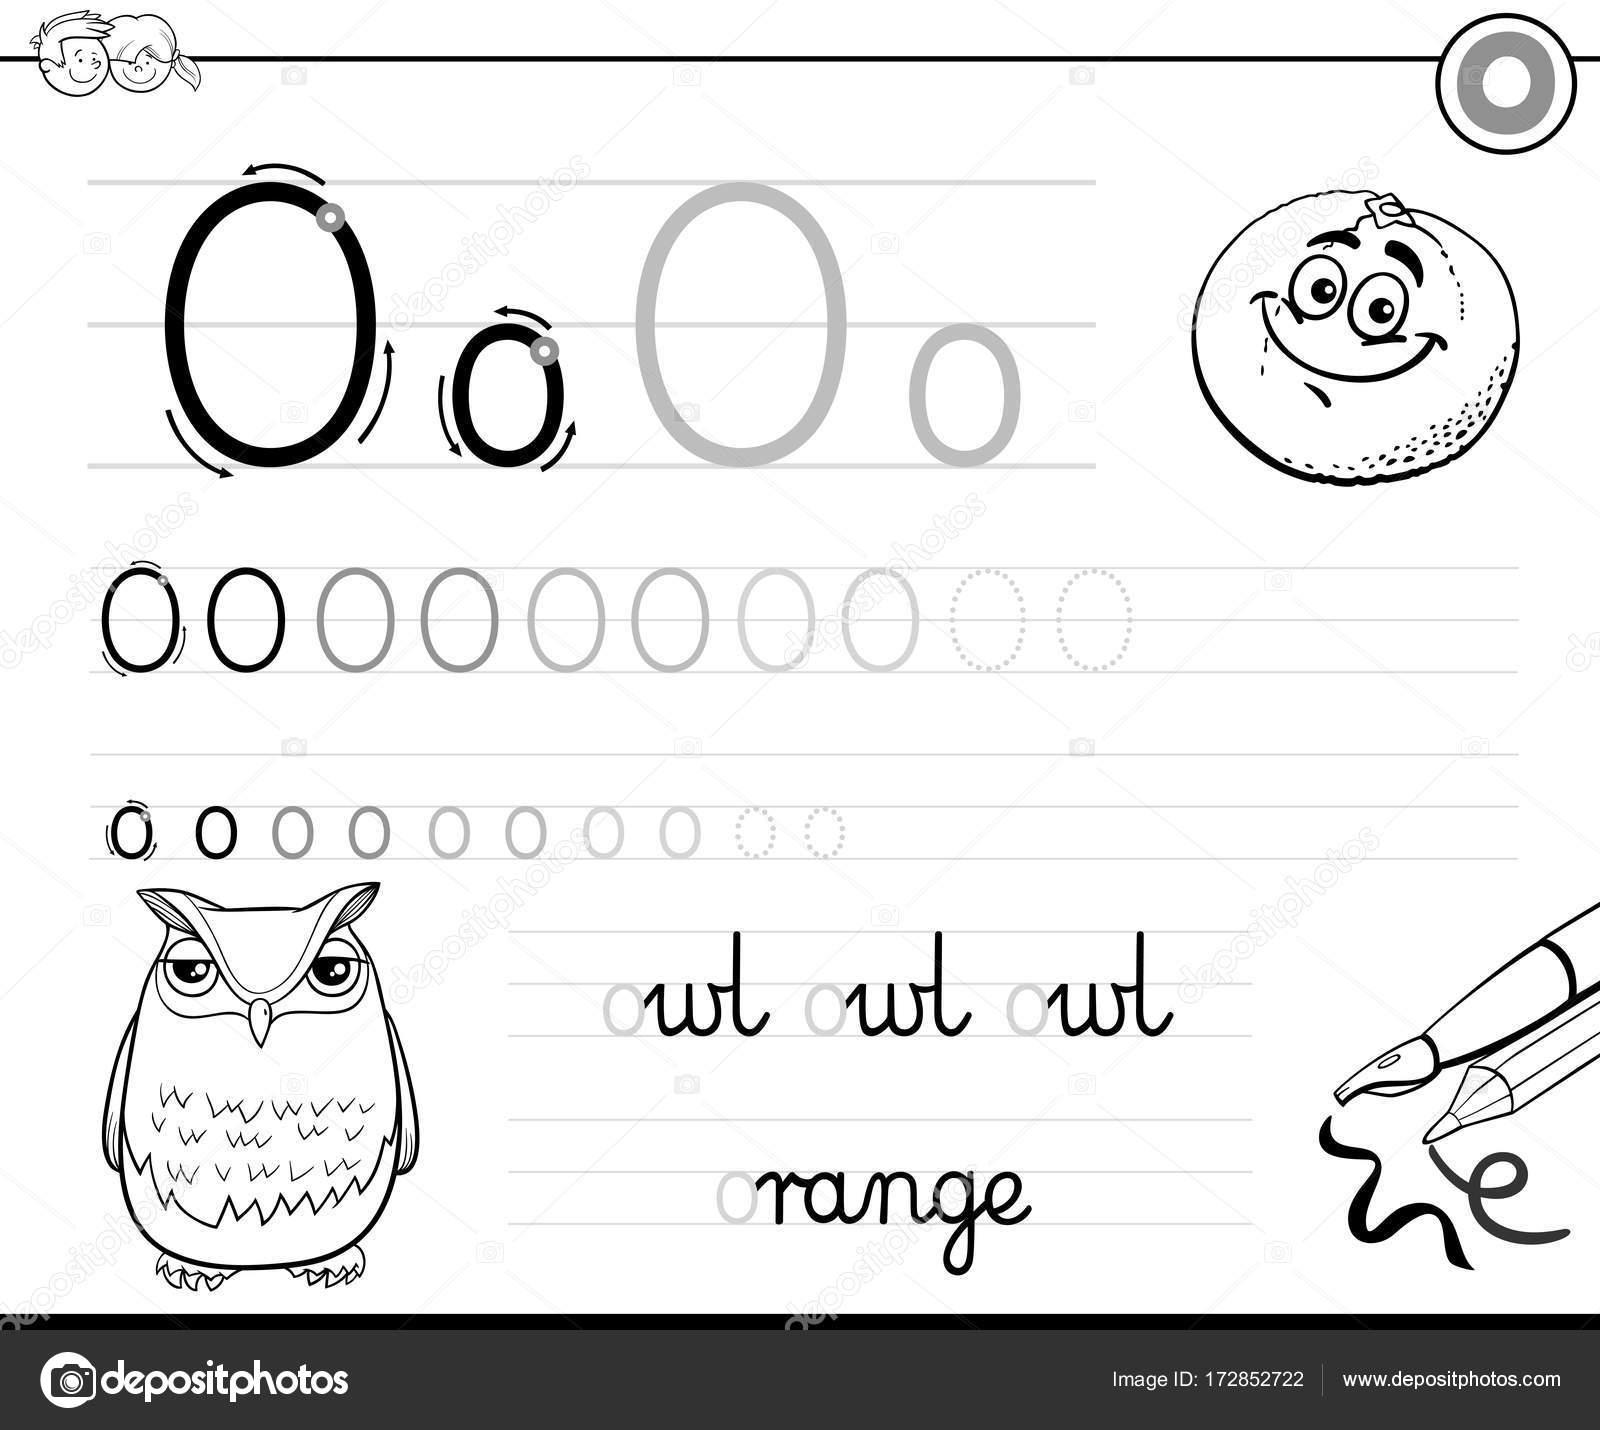 Preschool Worksheet Gallery Letter O Worksheets For Preschool